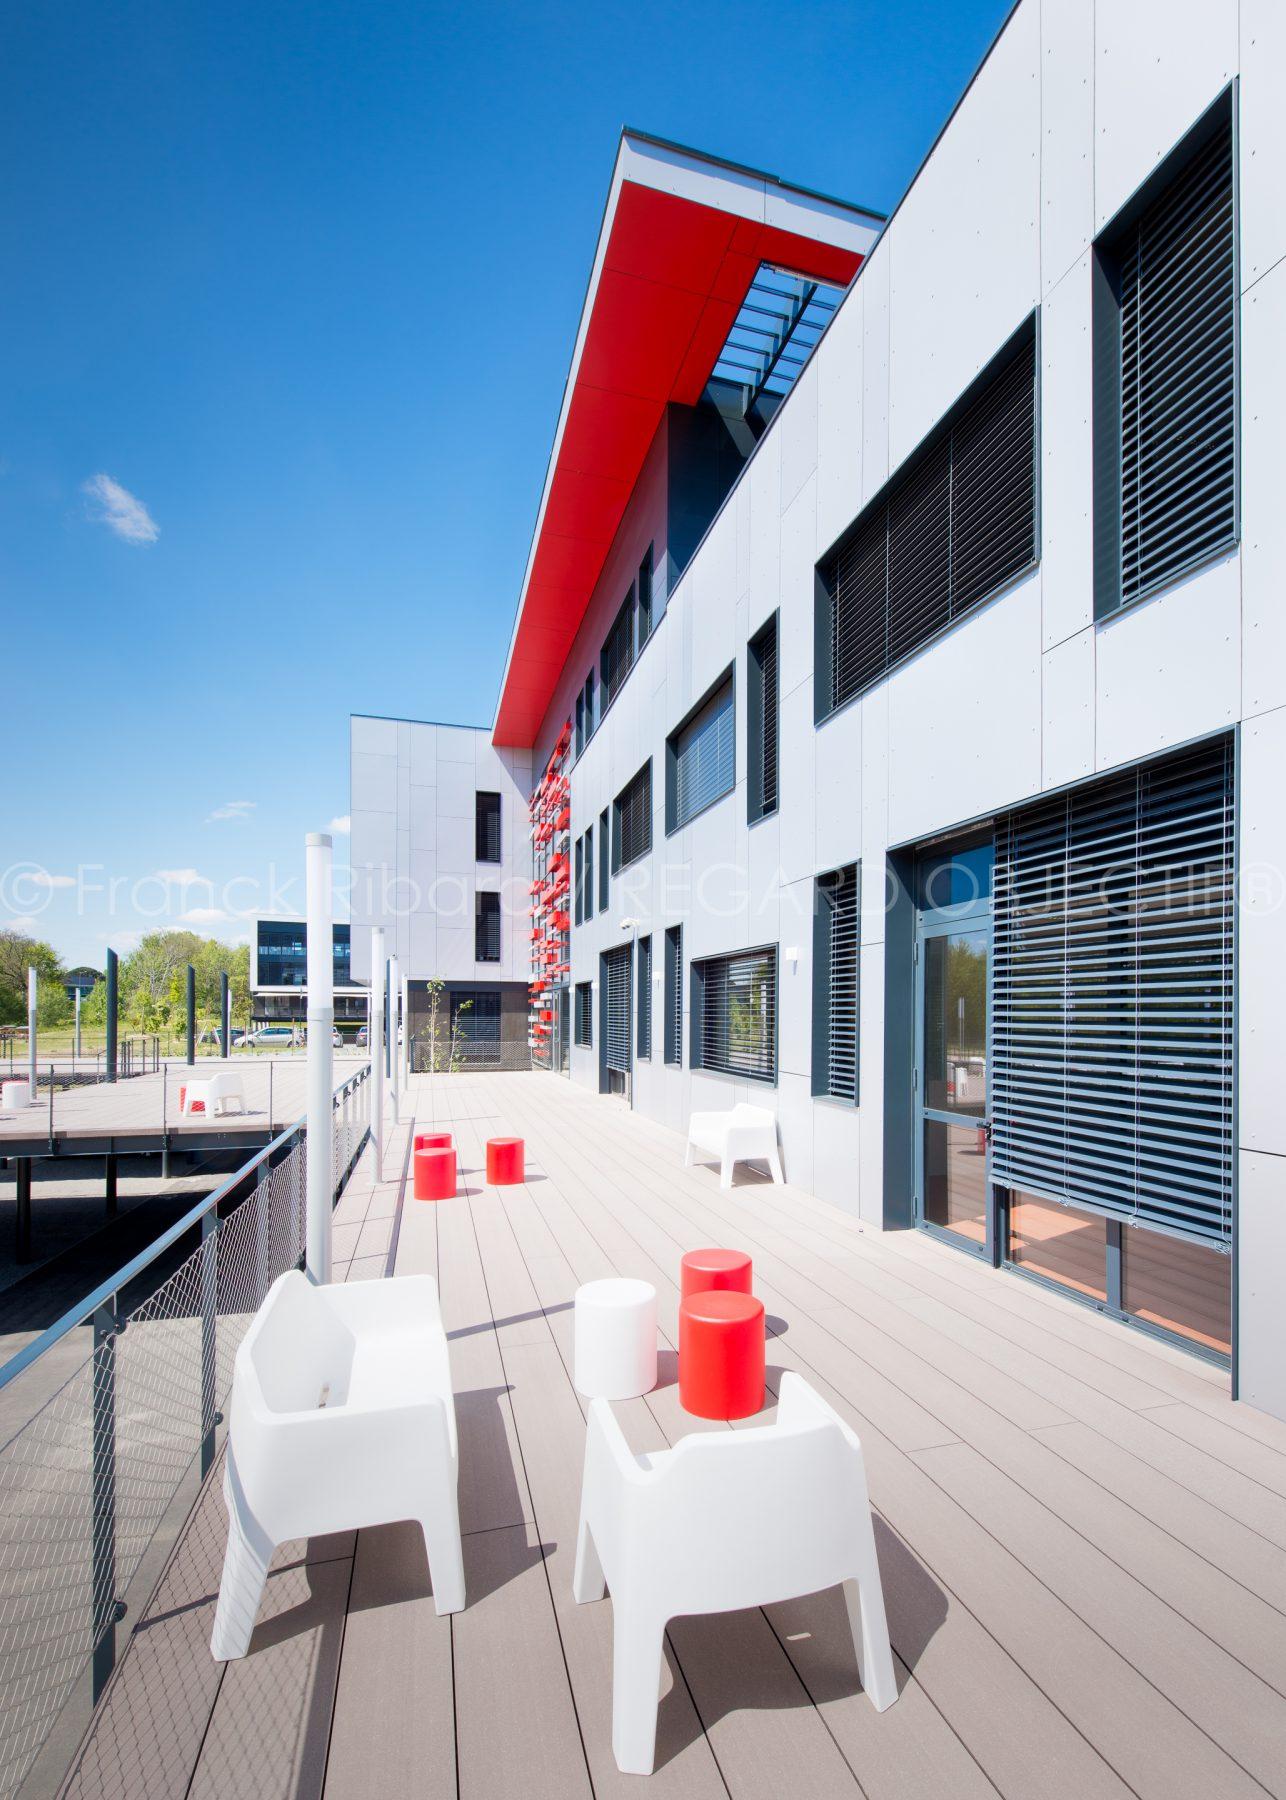 photographie de franck ribard - regard objectif - photographe architecture lyon - Carl Software